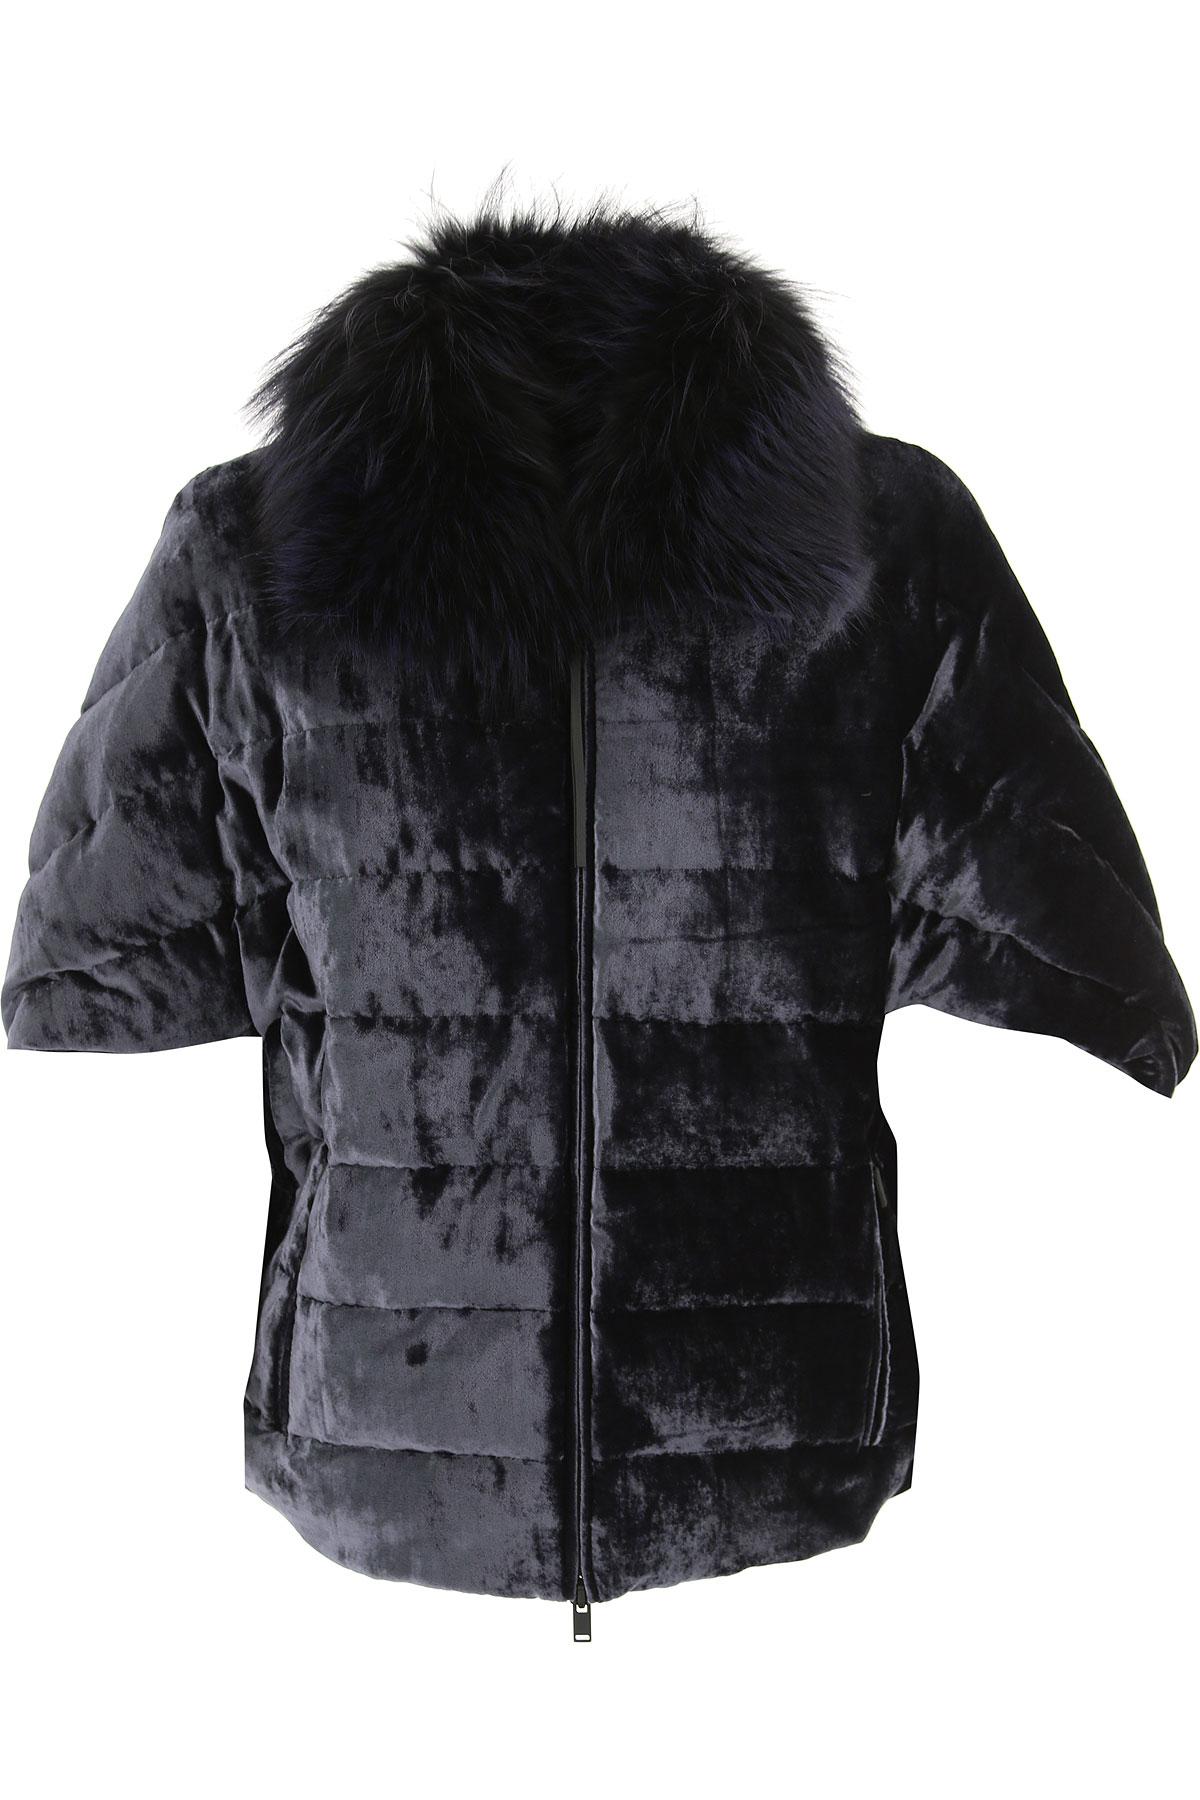 Image of Fabiana Filippi Down Jacket for Women, Puffer Ski Jacket, navy, Viscose, 2017, 6 8